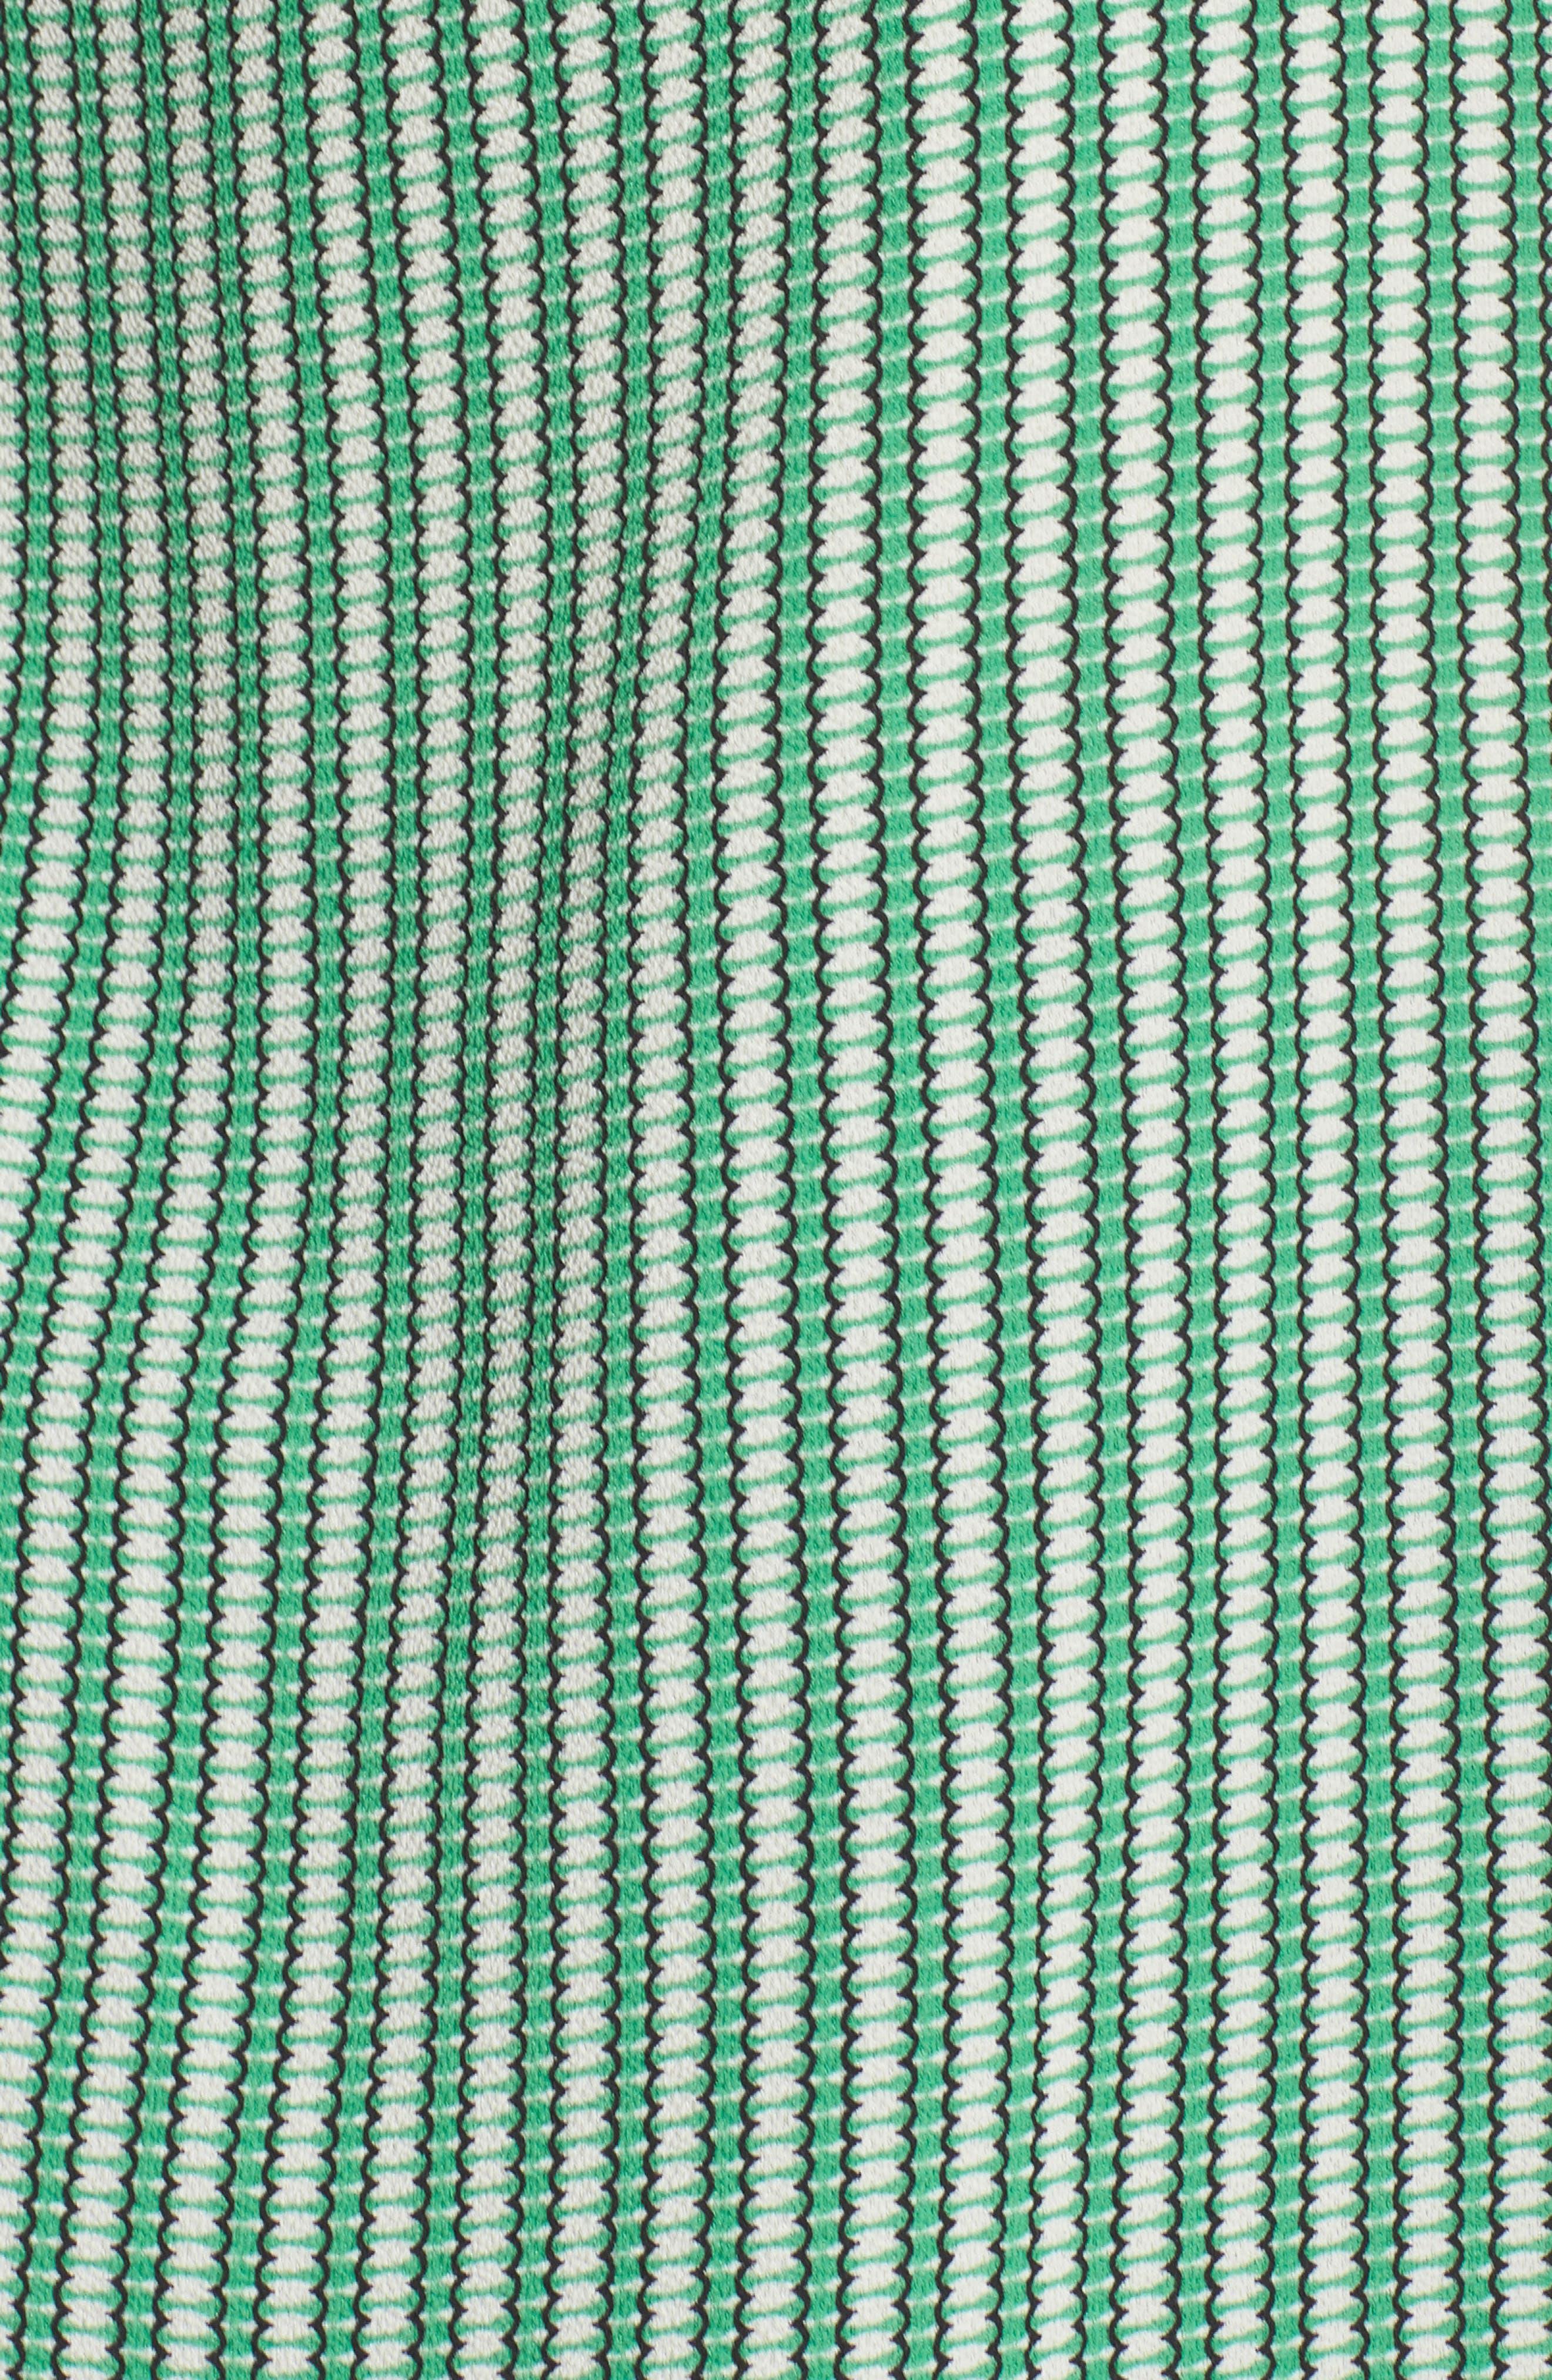 Linear Motion Print Long Sleeve Tunic,                             Alternate thumbnail 5, color,                             EMERALD LEAF